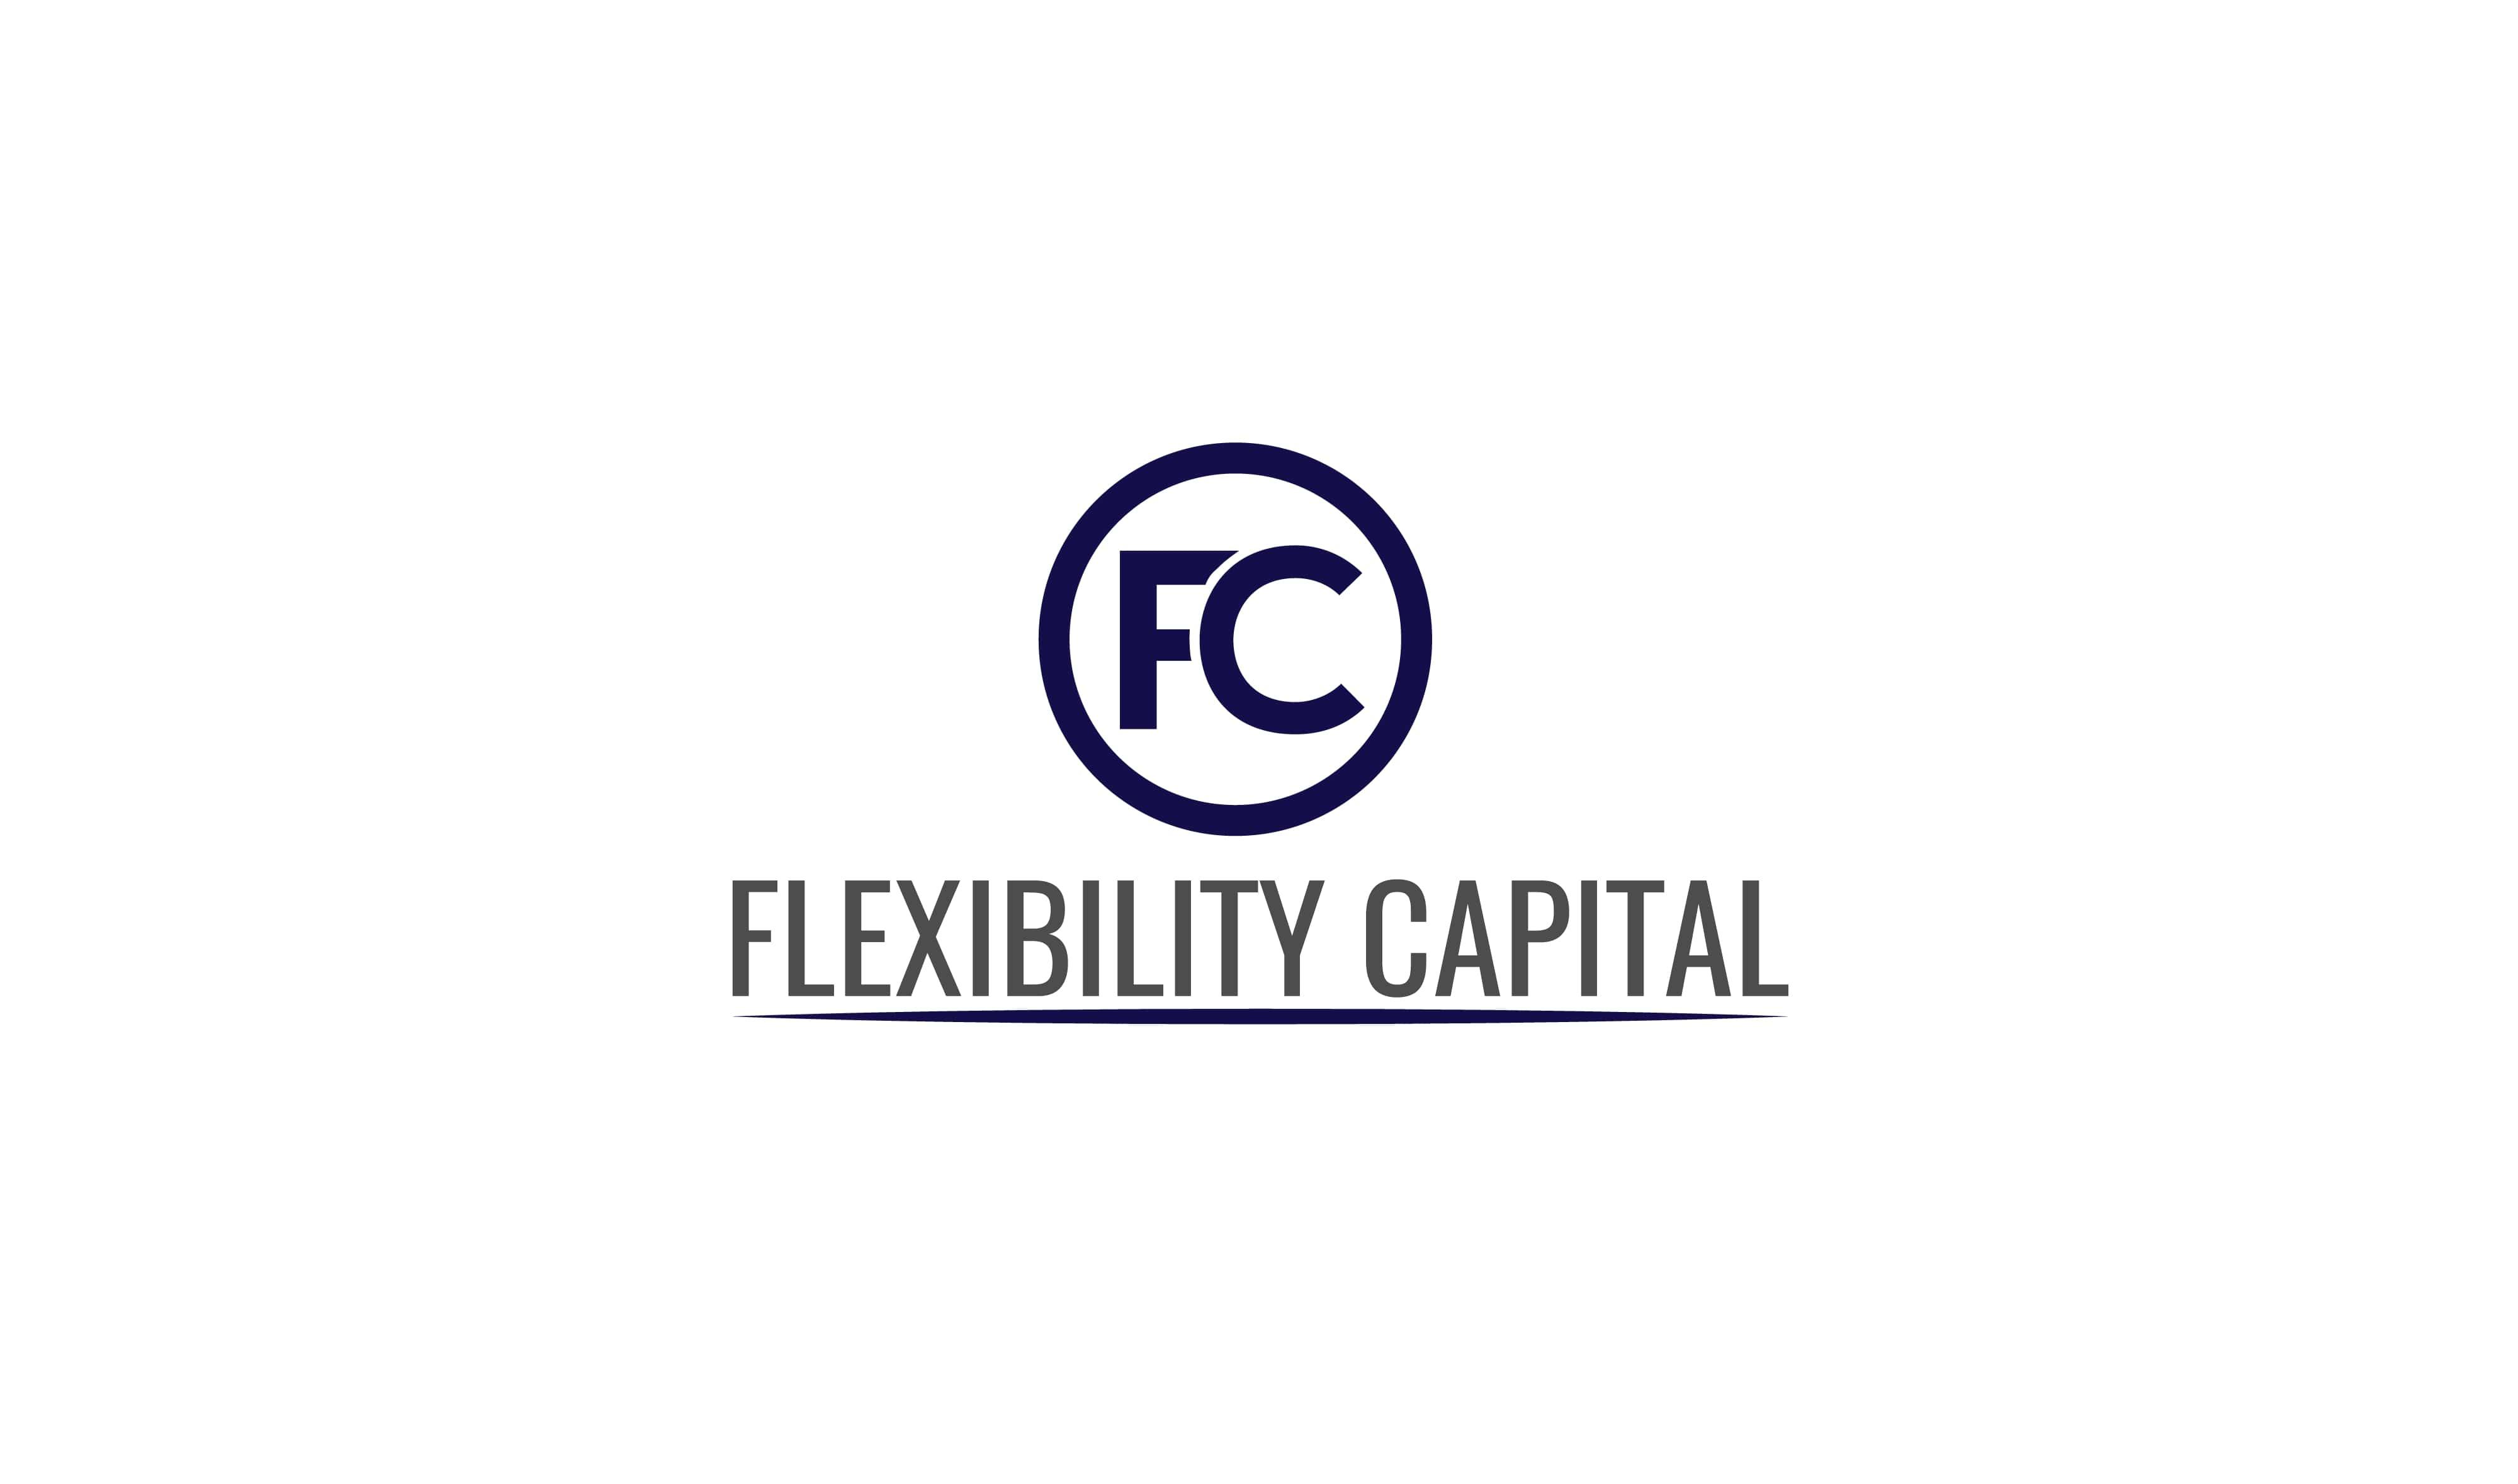 Flexibility Capital